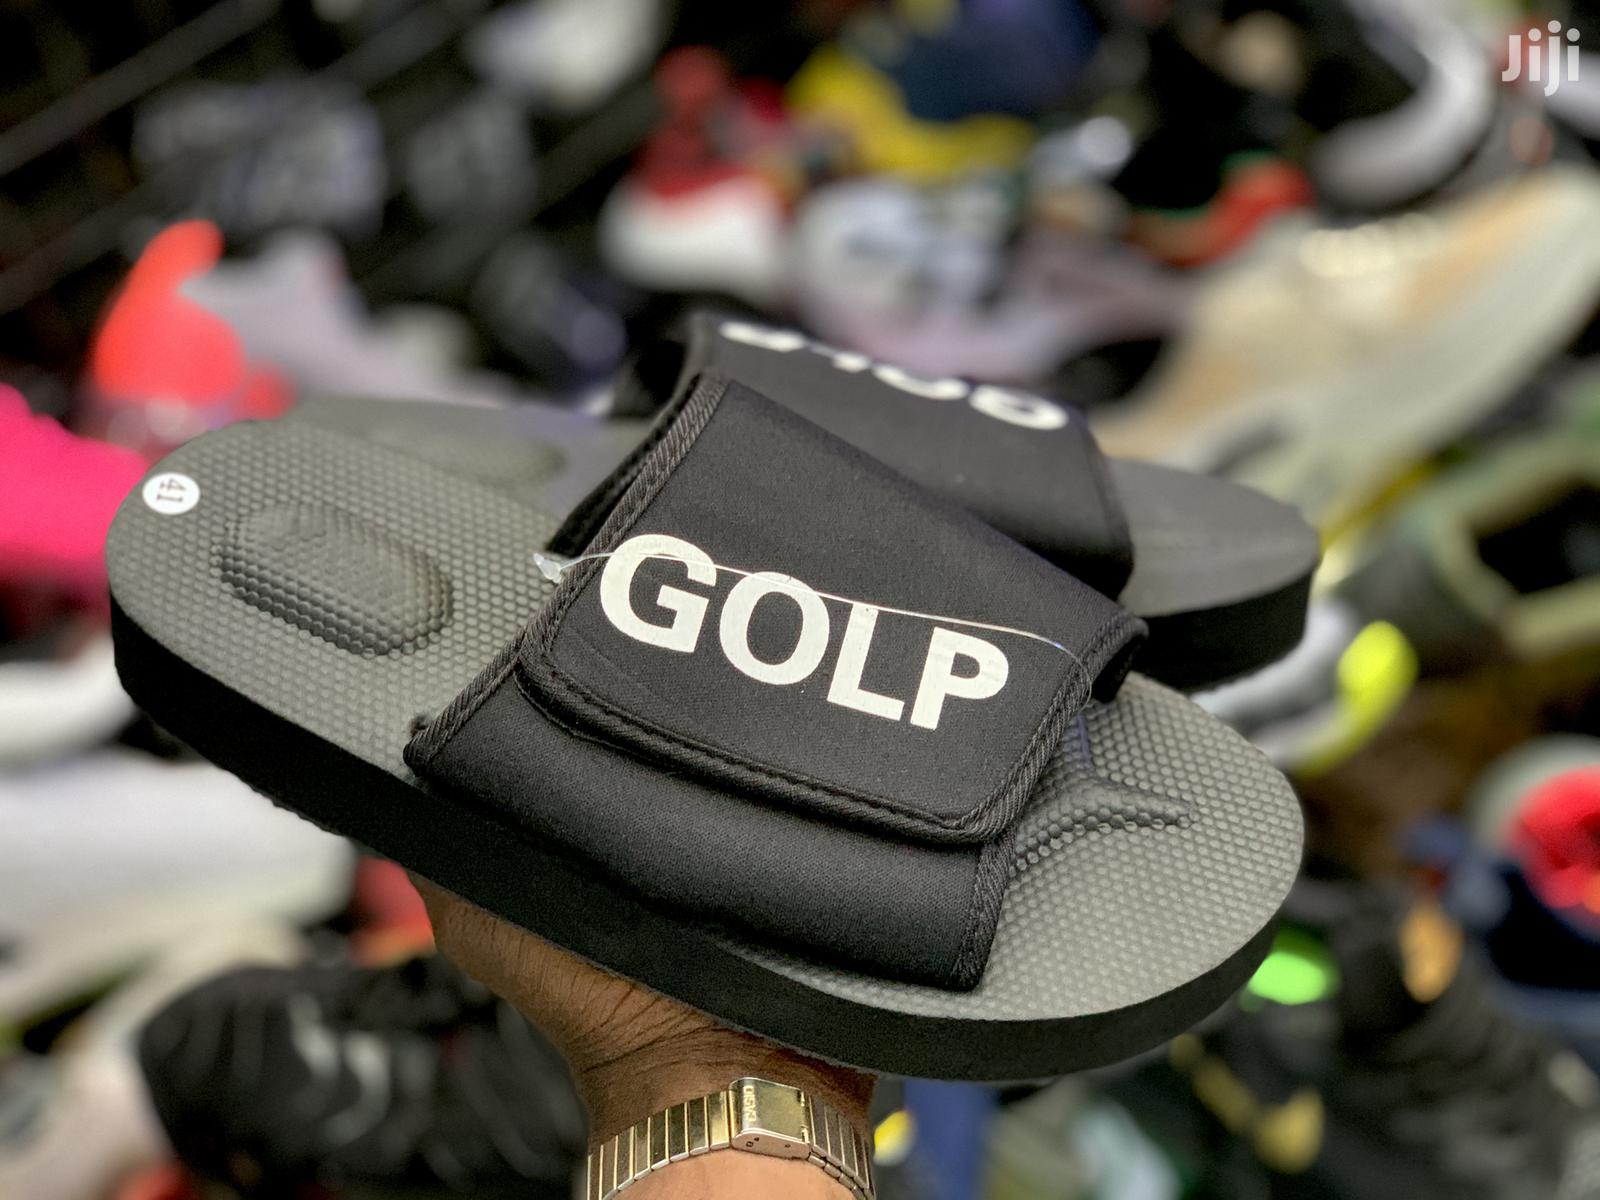 GOLP Slides in Kumasi Metropolitan - Shoes, Bright Quache Wood | Jiji.com.gh